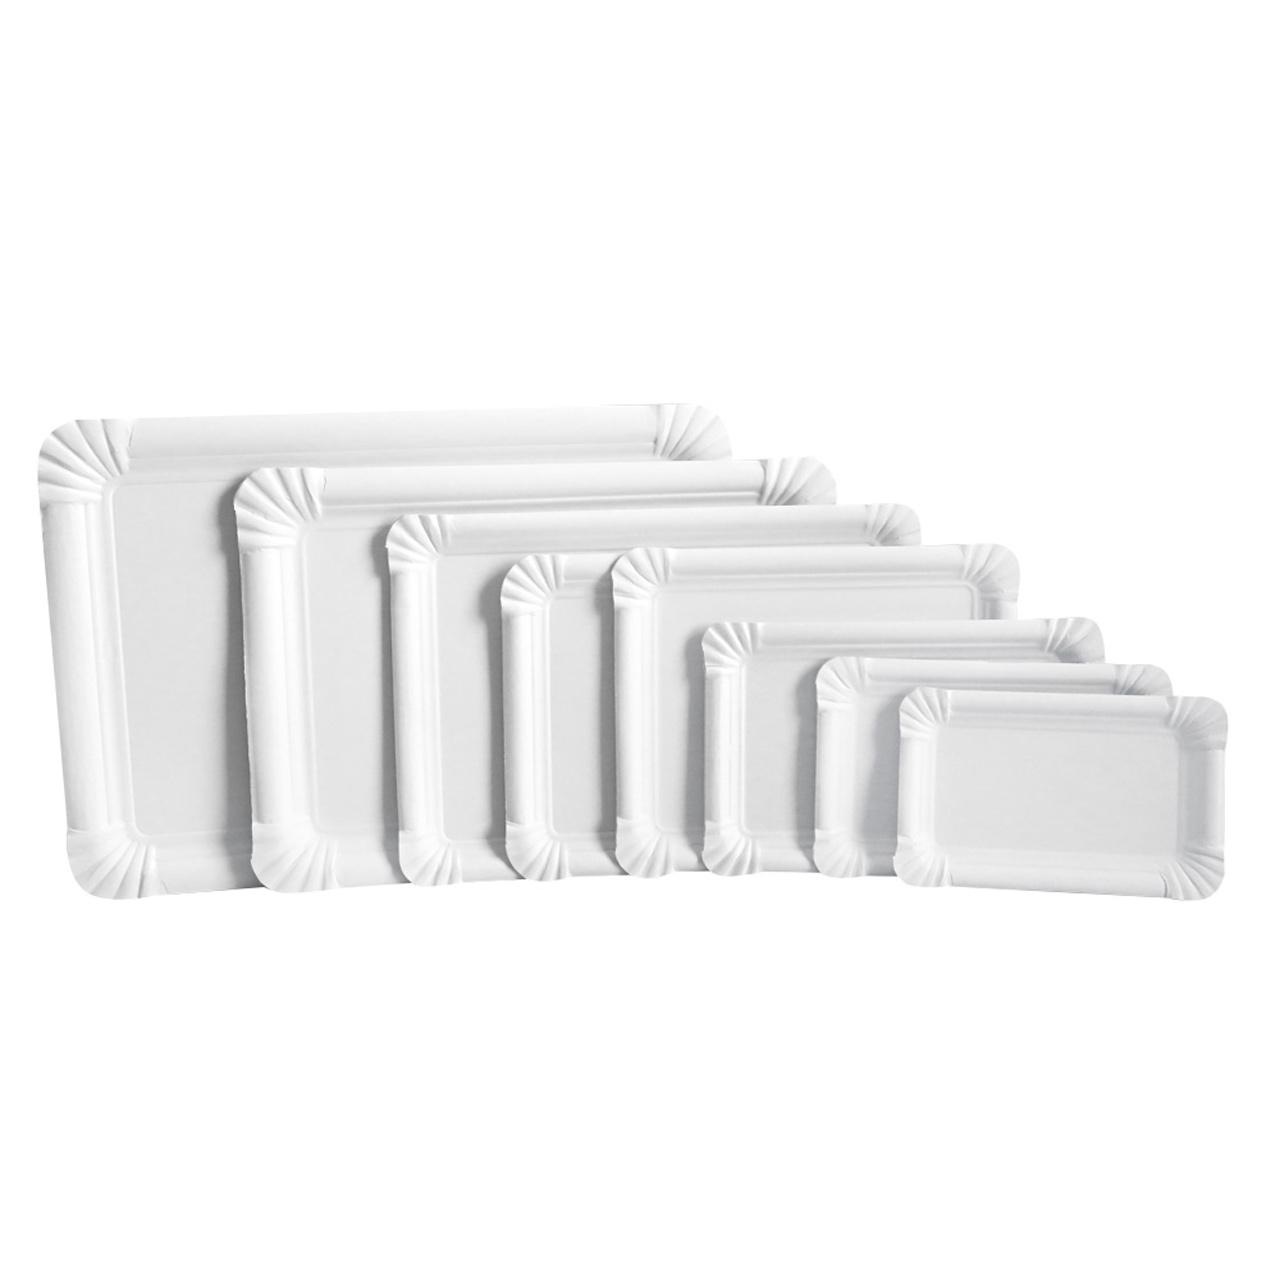 250 Pappteller 23x33 cm Kuchenteller weiß